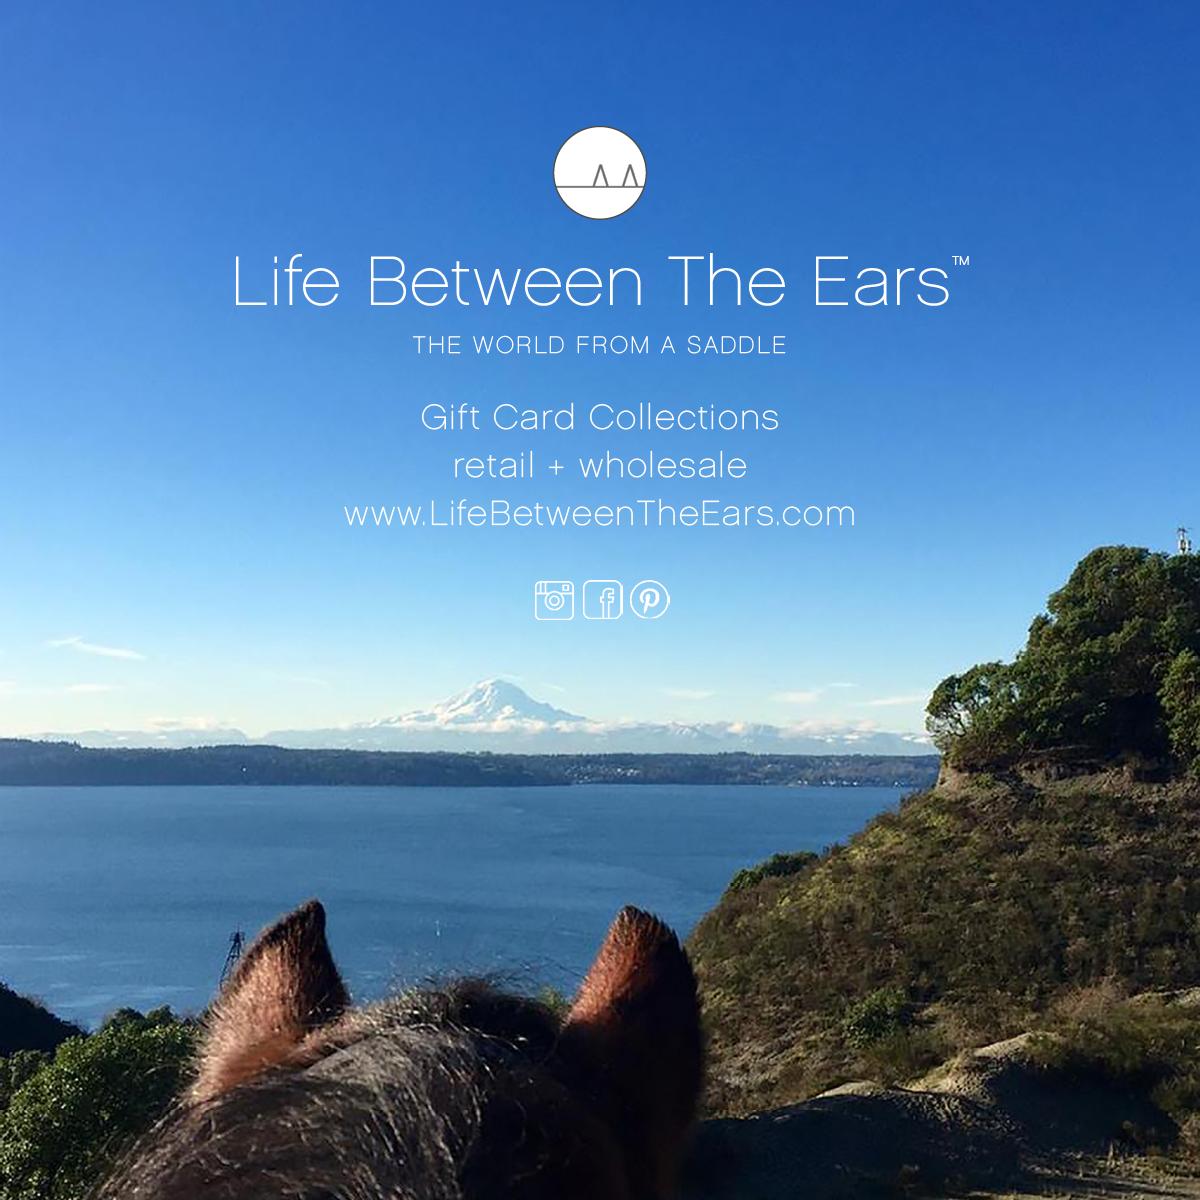 Life Between The Ears